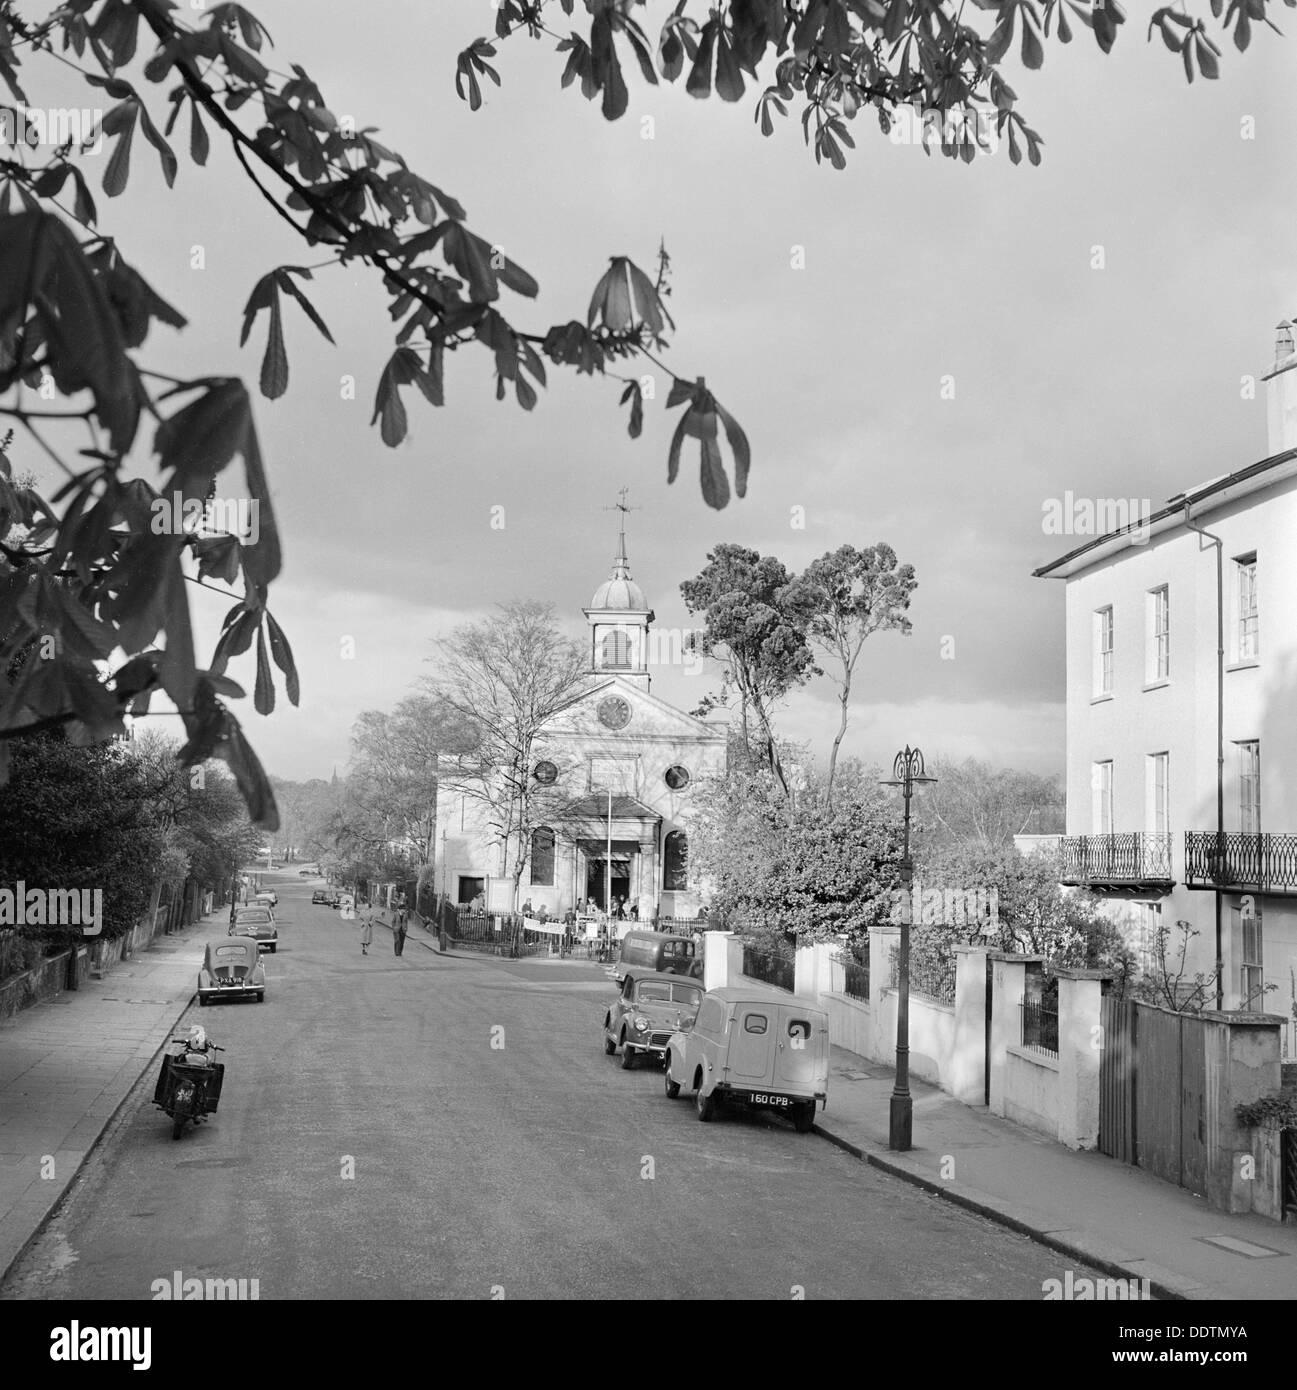 St John's Church, Downshire Hill, Hampstead, London, 1960-1965. Artist: John Gay - Stock Image